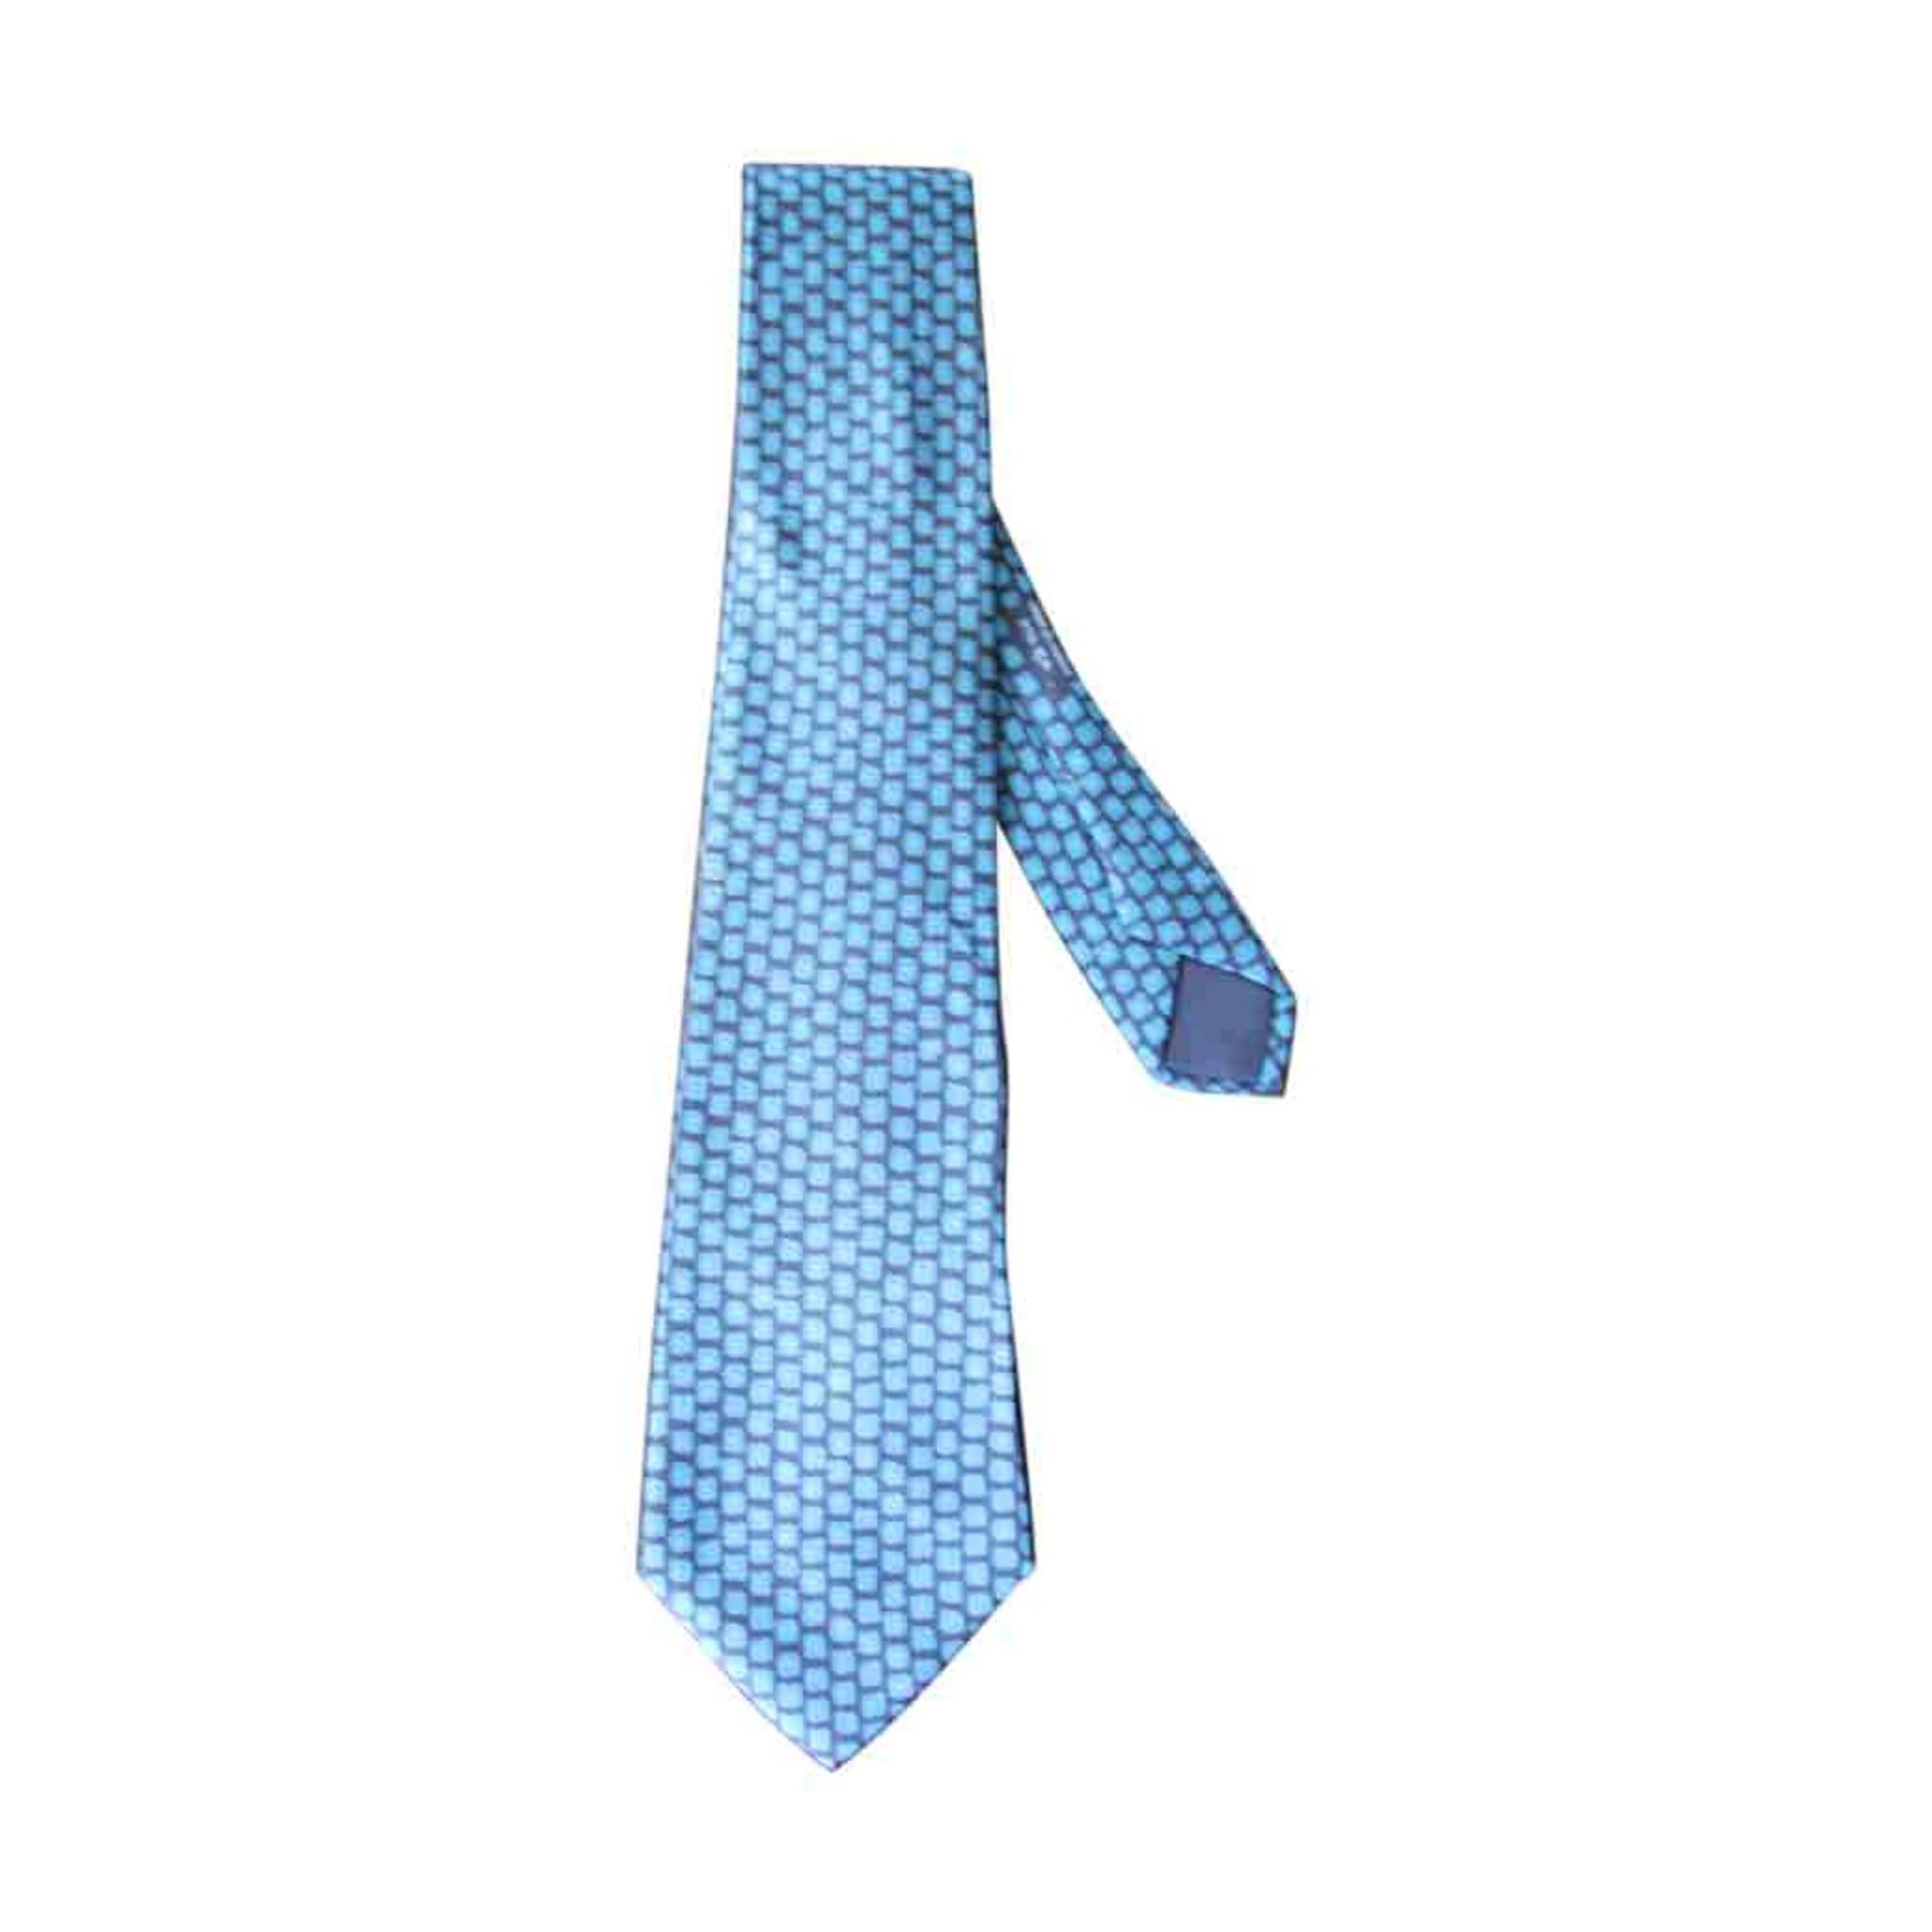 dc20e3b71a9 Cravate HERMÈS bleu - 2409984